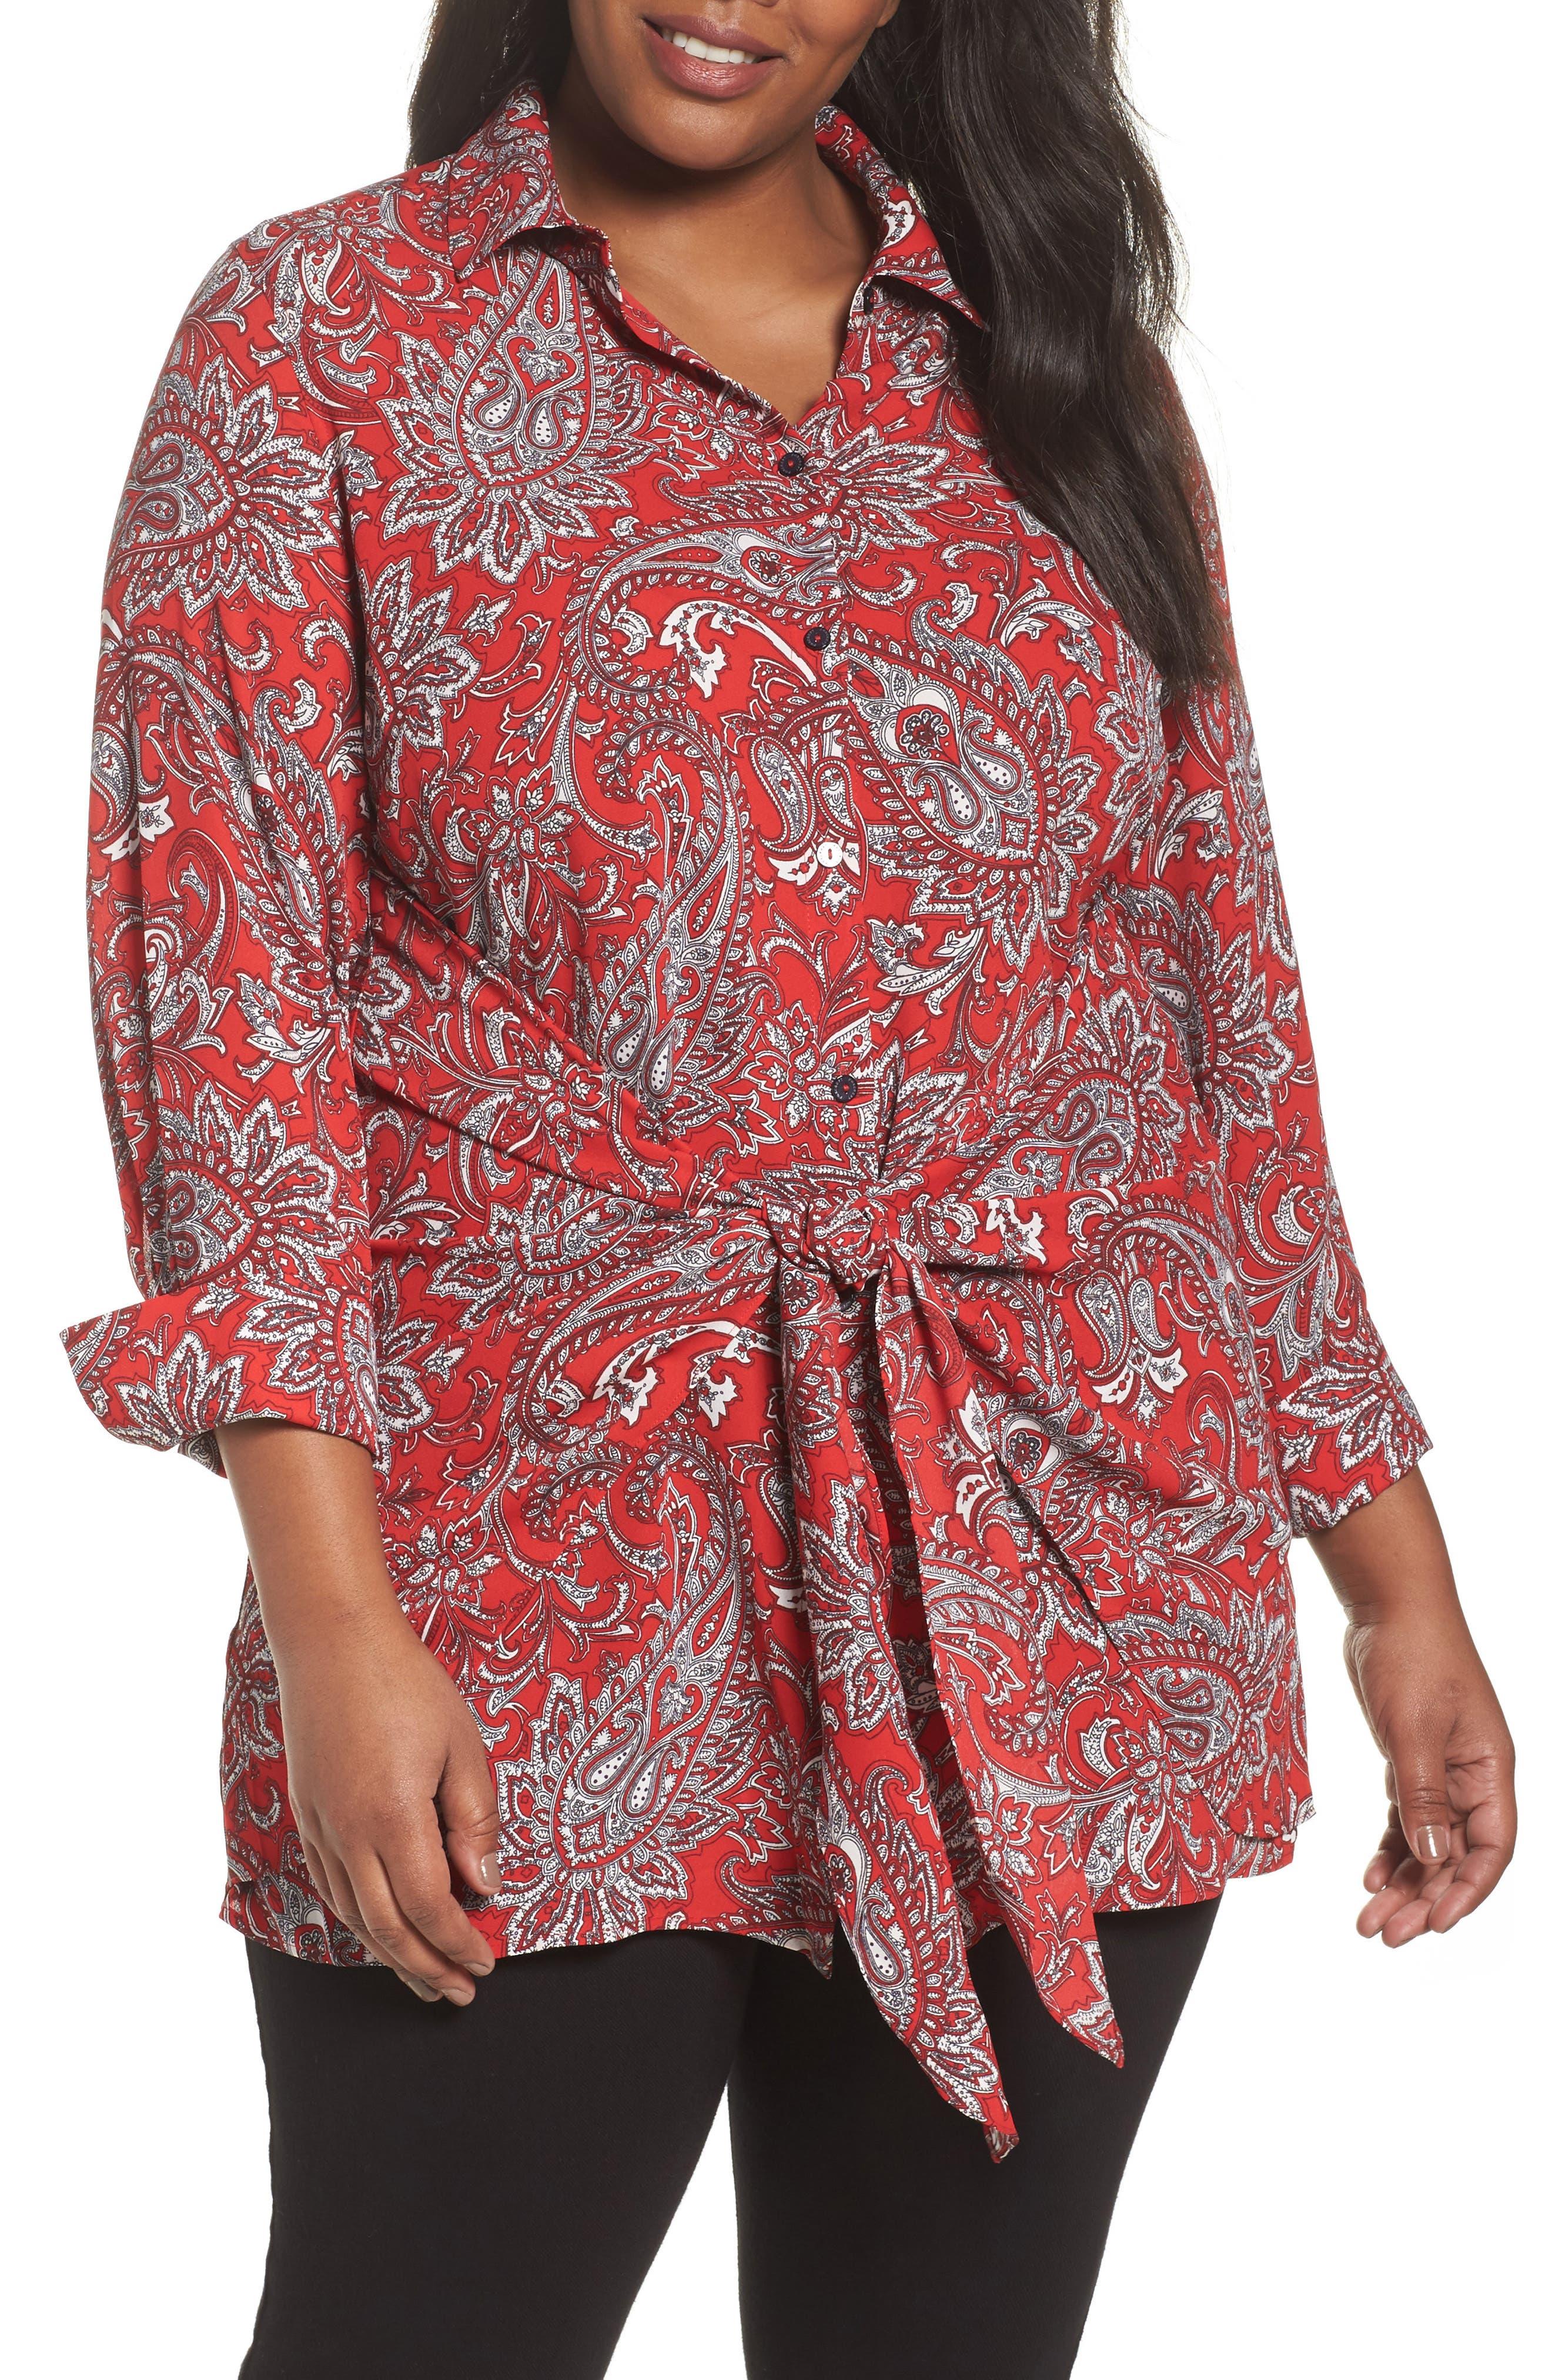 Main Image - Foxcroft Serena Romantic Paisley Knotted Crepe Tunic Blouse (Plus Size)